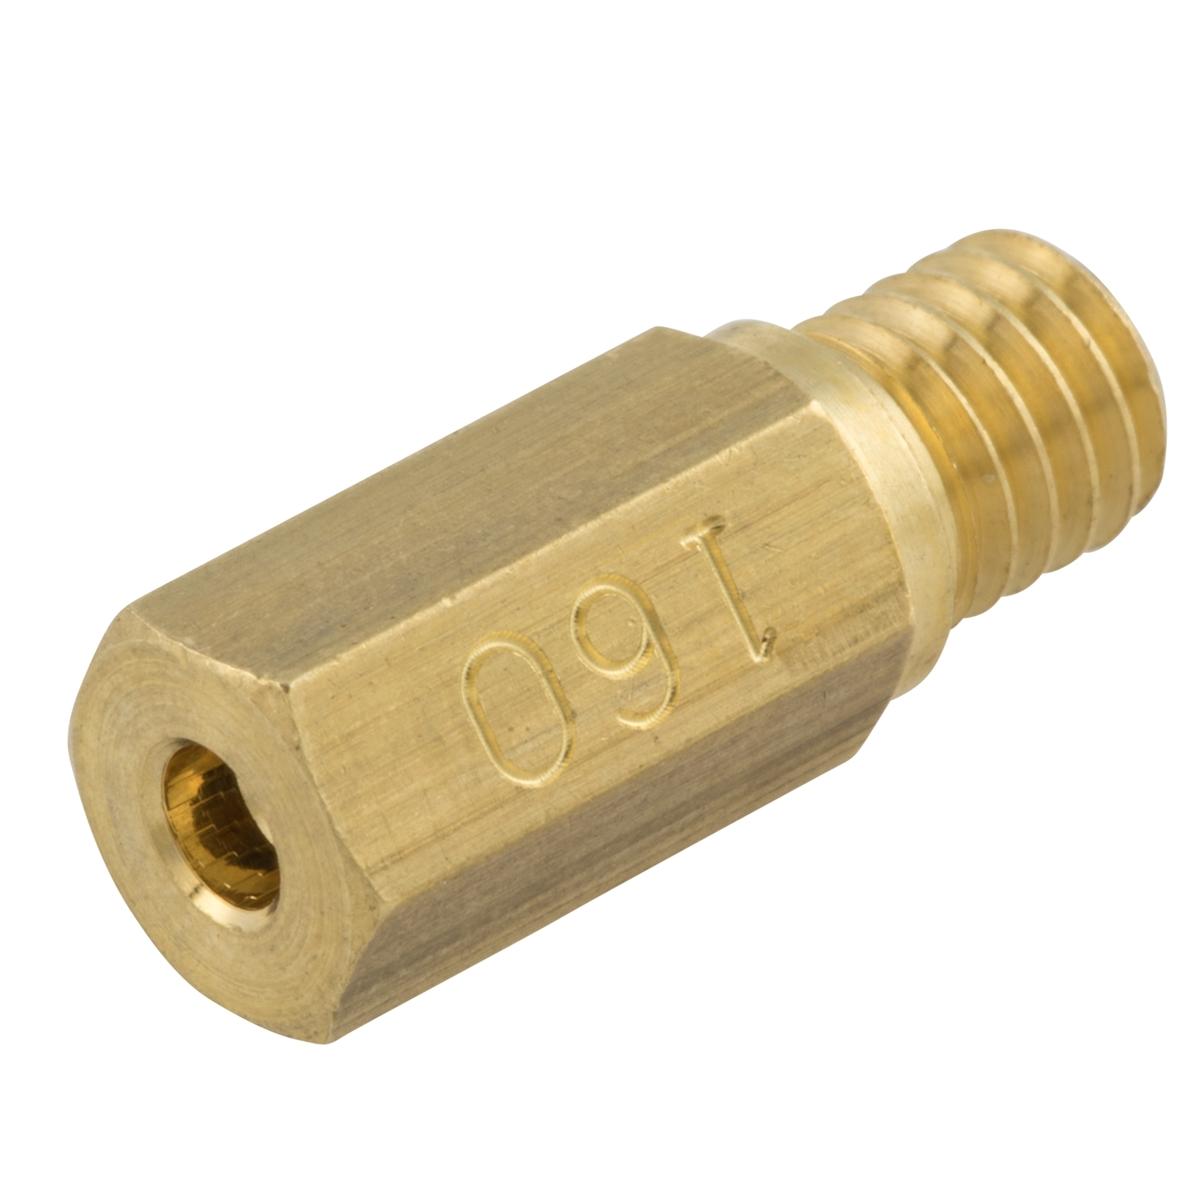 Produktbild für 'Düse KMT 165 Ø 6 mm'